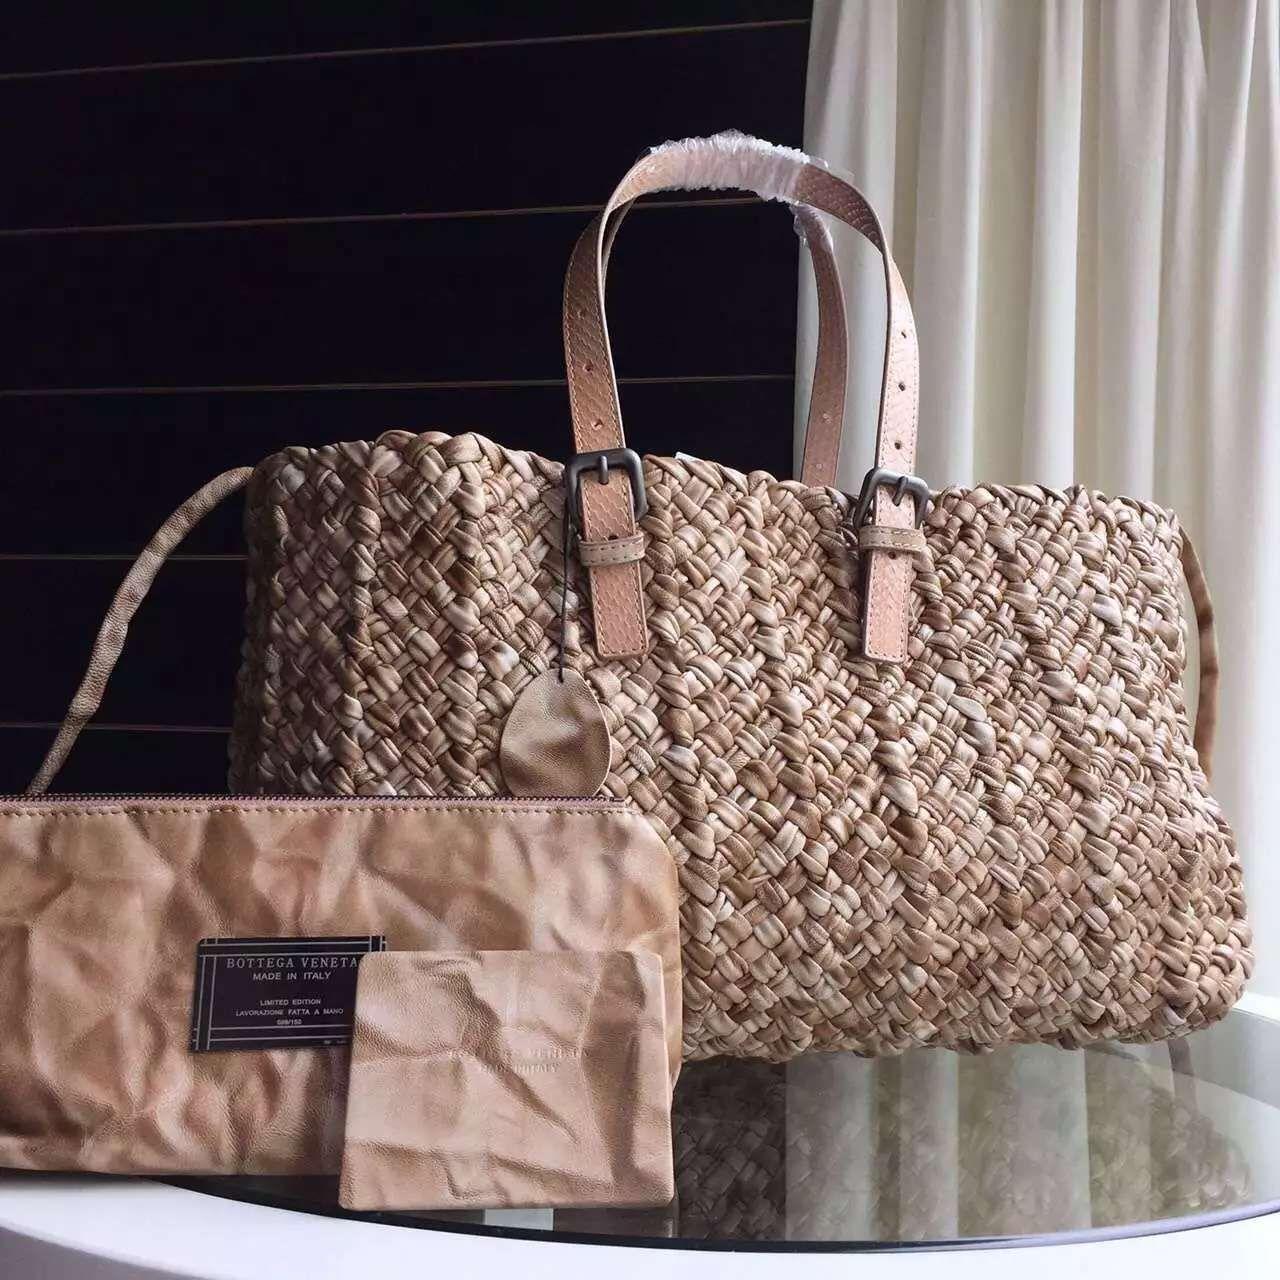 Bottega Veneta Bag Id 29892 Forsale A Yybags Com Bonetta